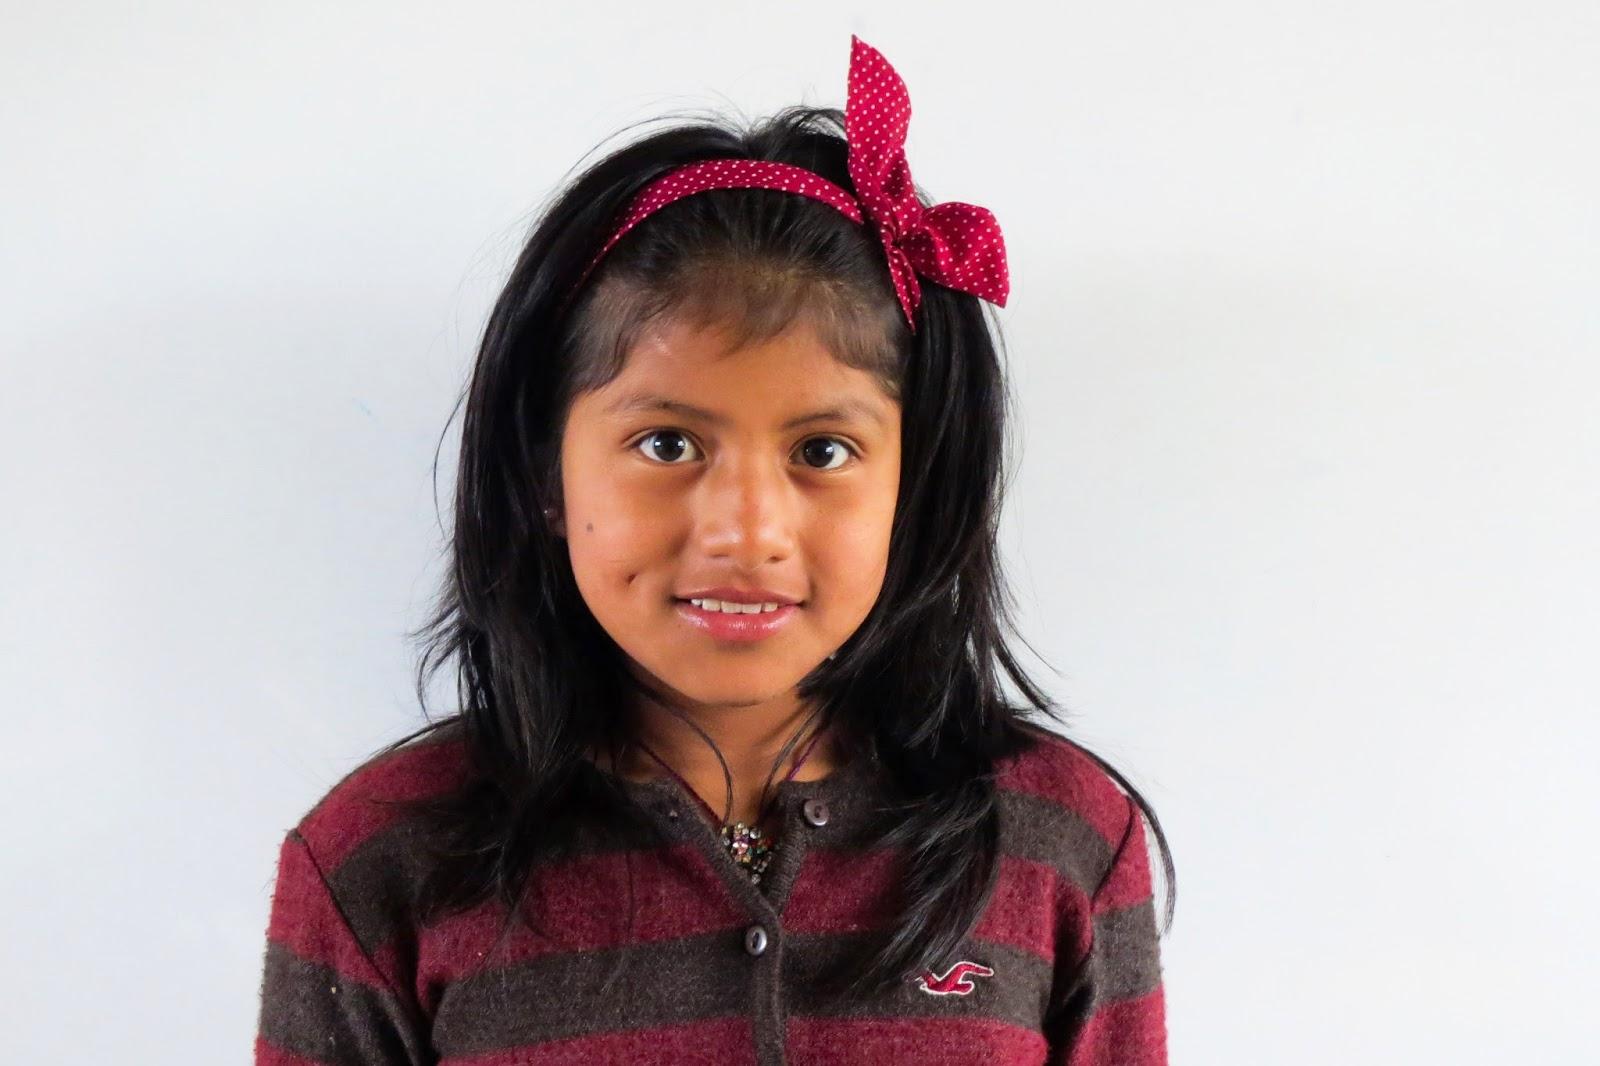 Adriana, Age 12